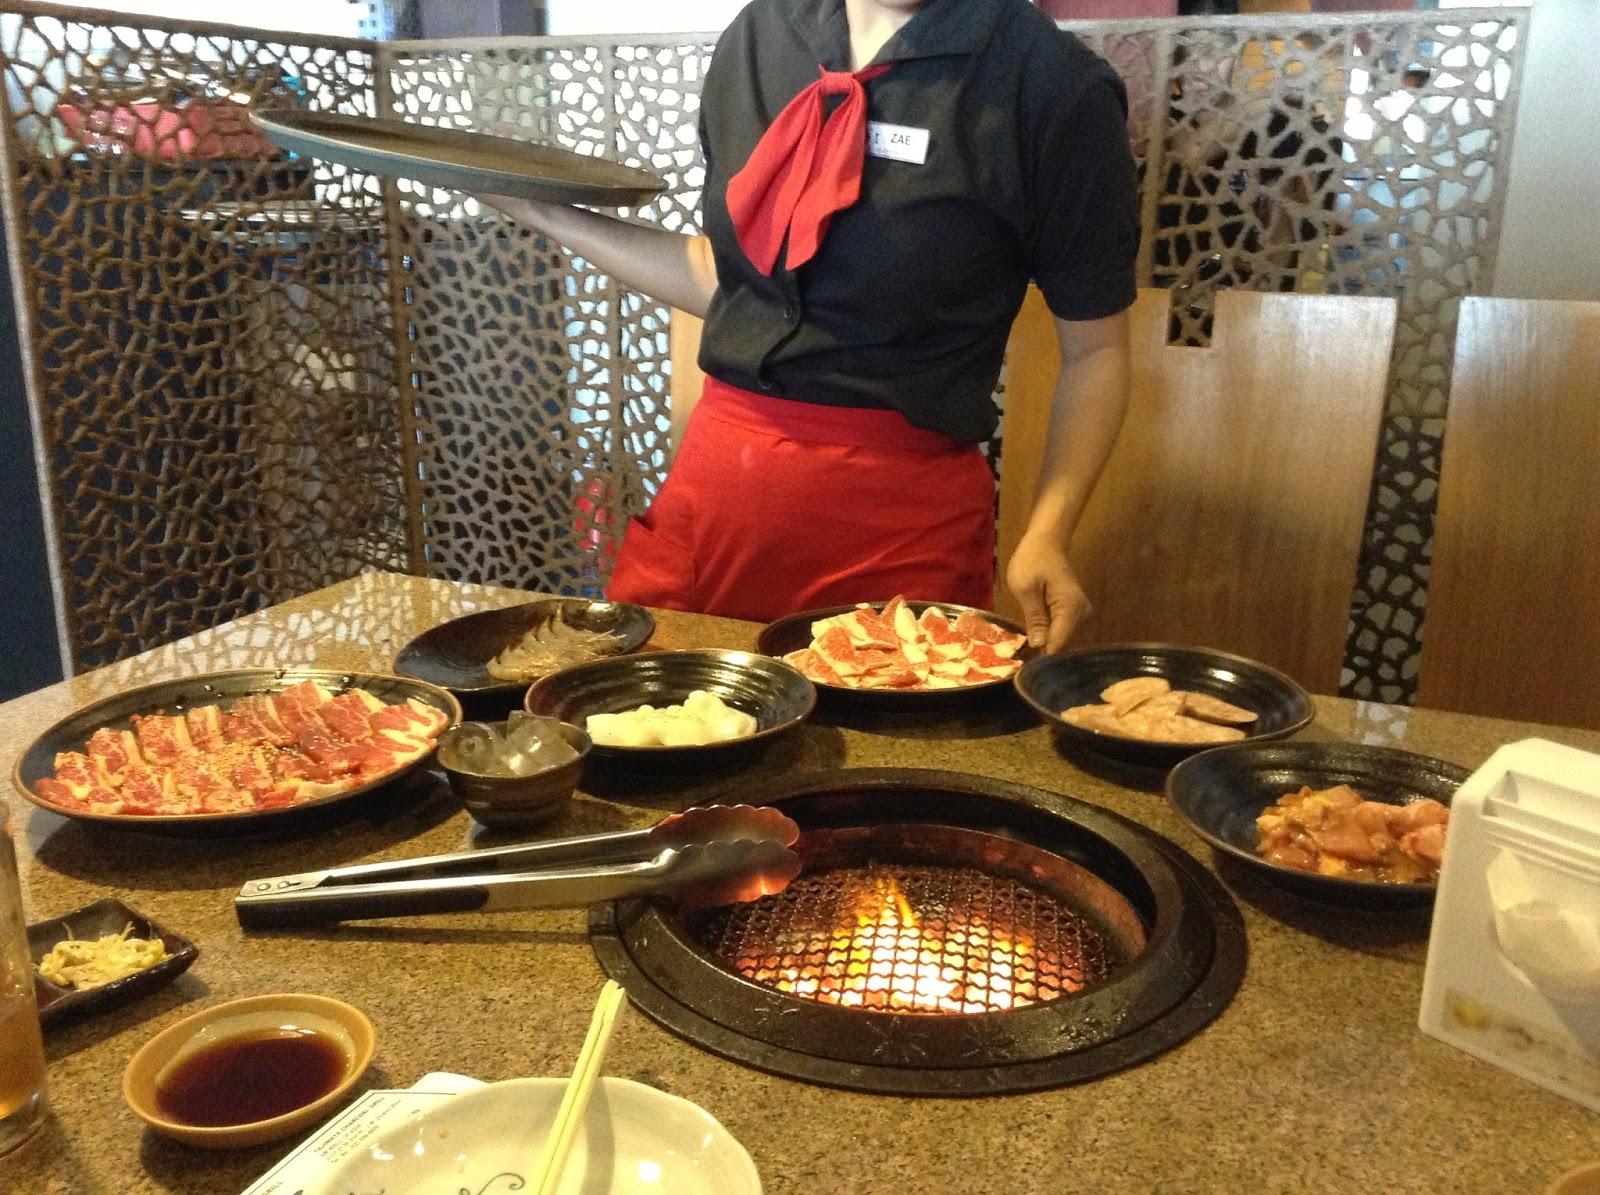 tajimaya yakiniku grill eat all you can mall of asia the foodinista rh thefoodinistaph blogspot com